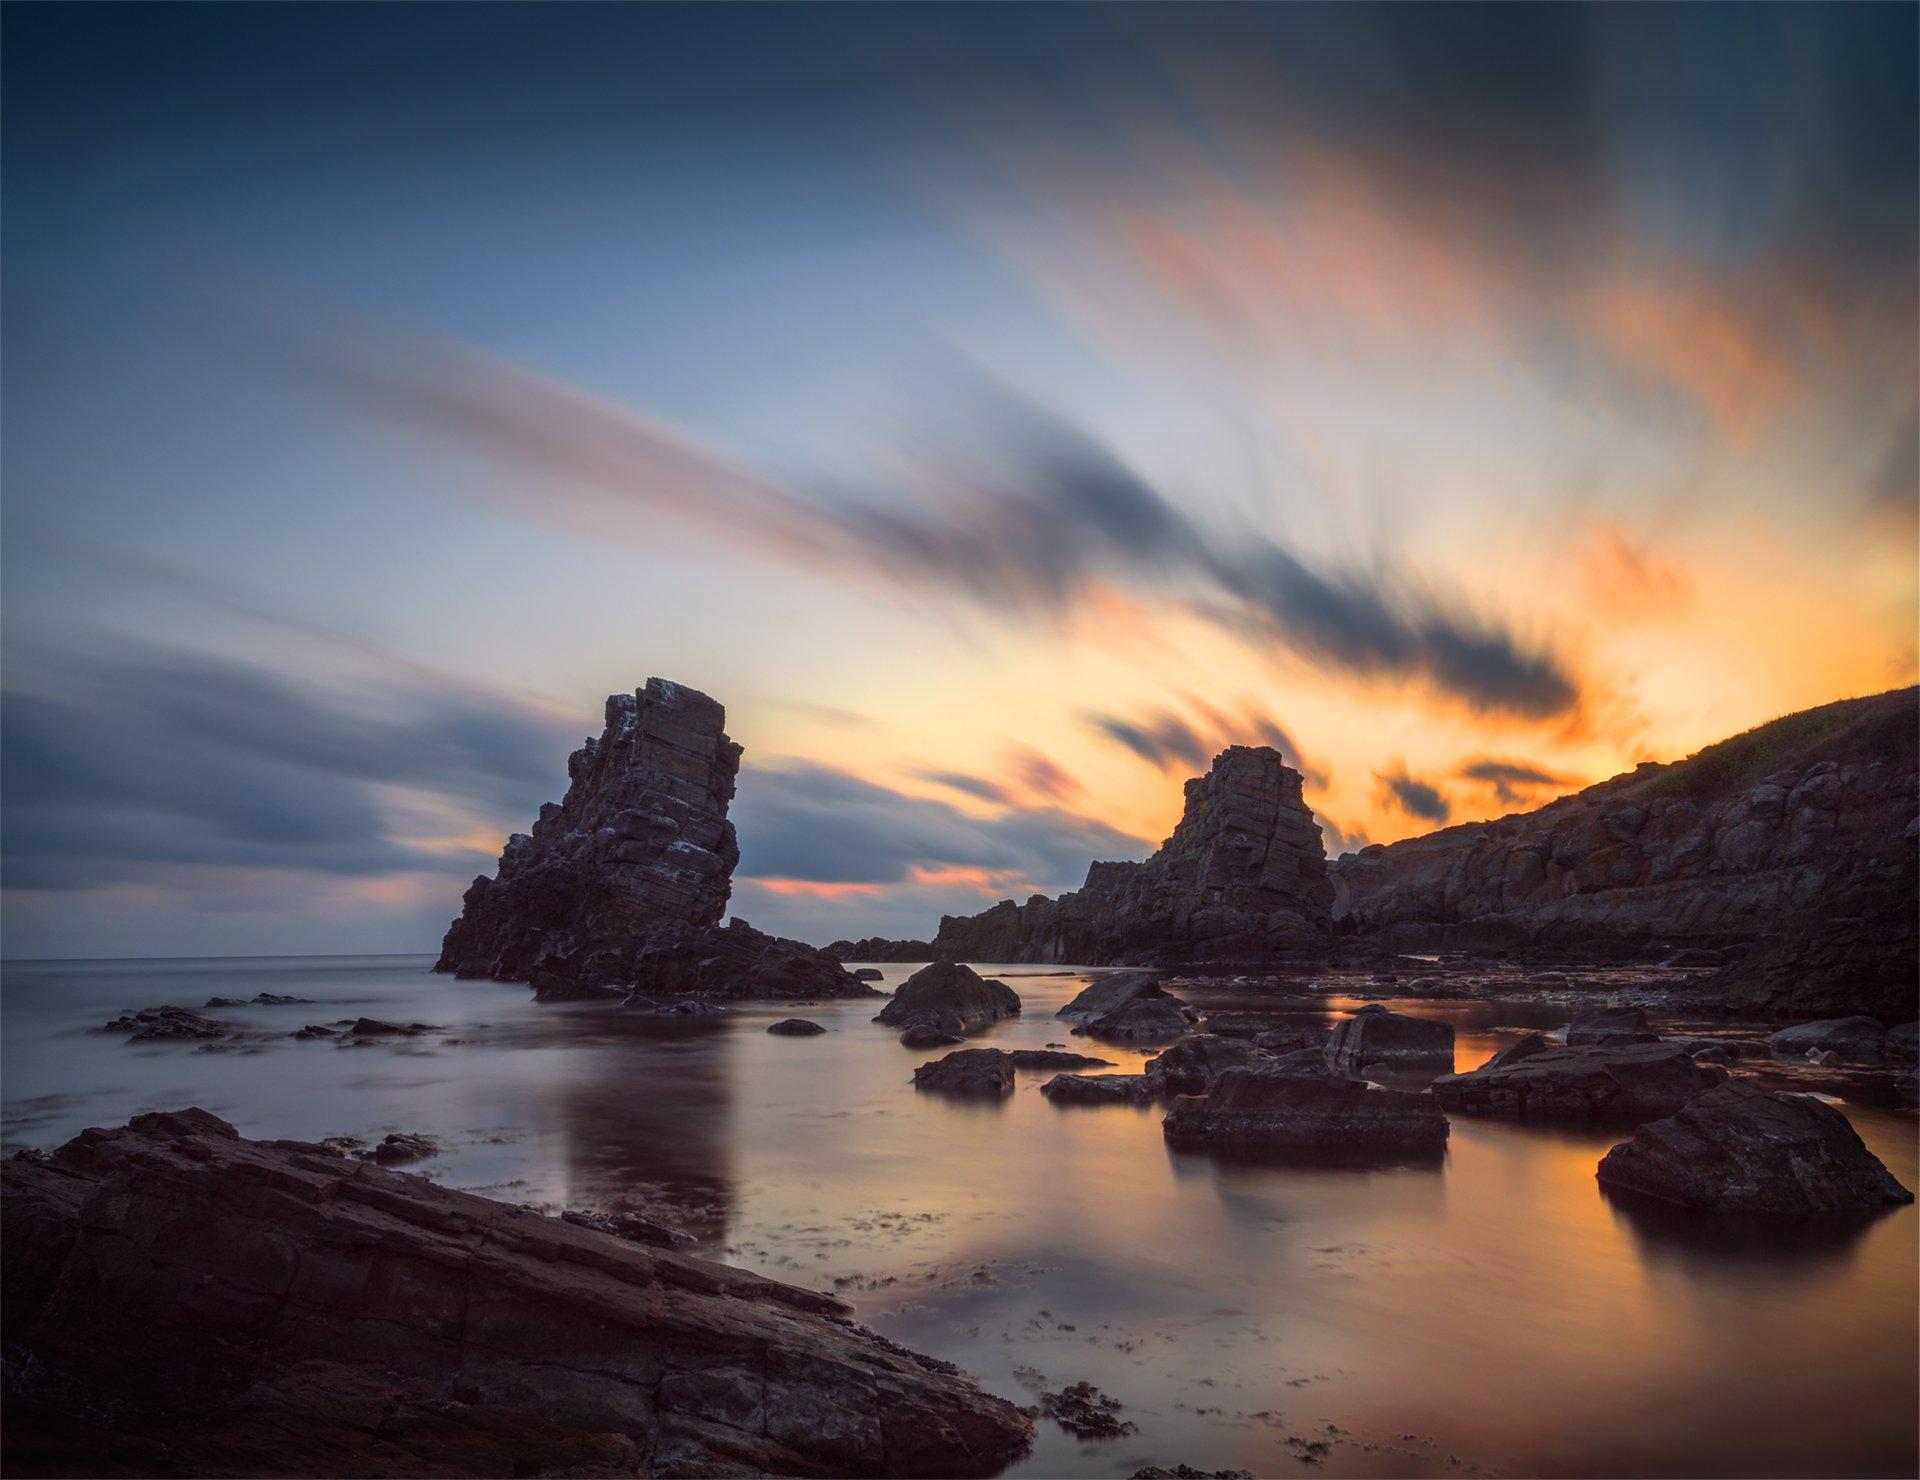 landscape nature seascape rocks castal coast beach sea seaside long exposure scenery  sunrise cloudy bulgaria, Александър Александров